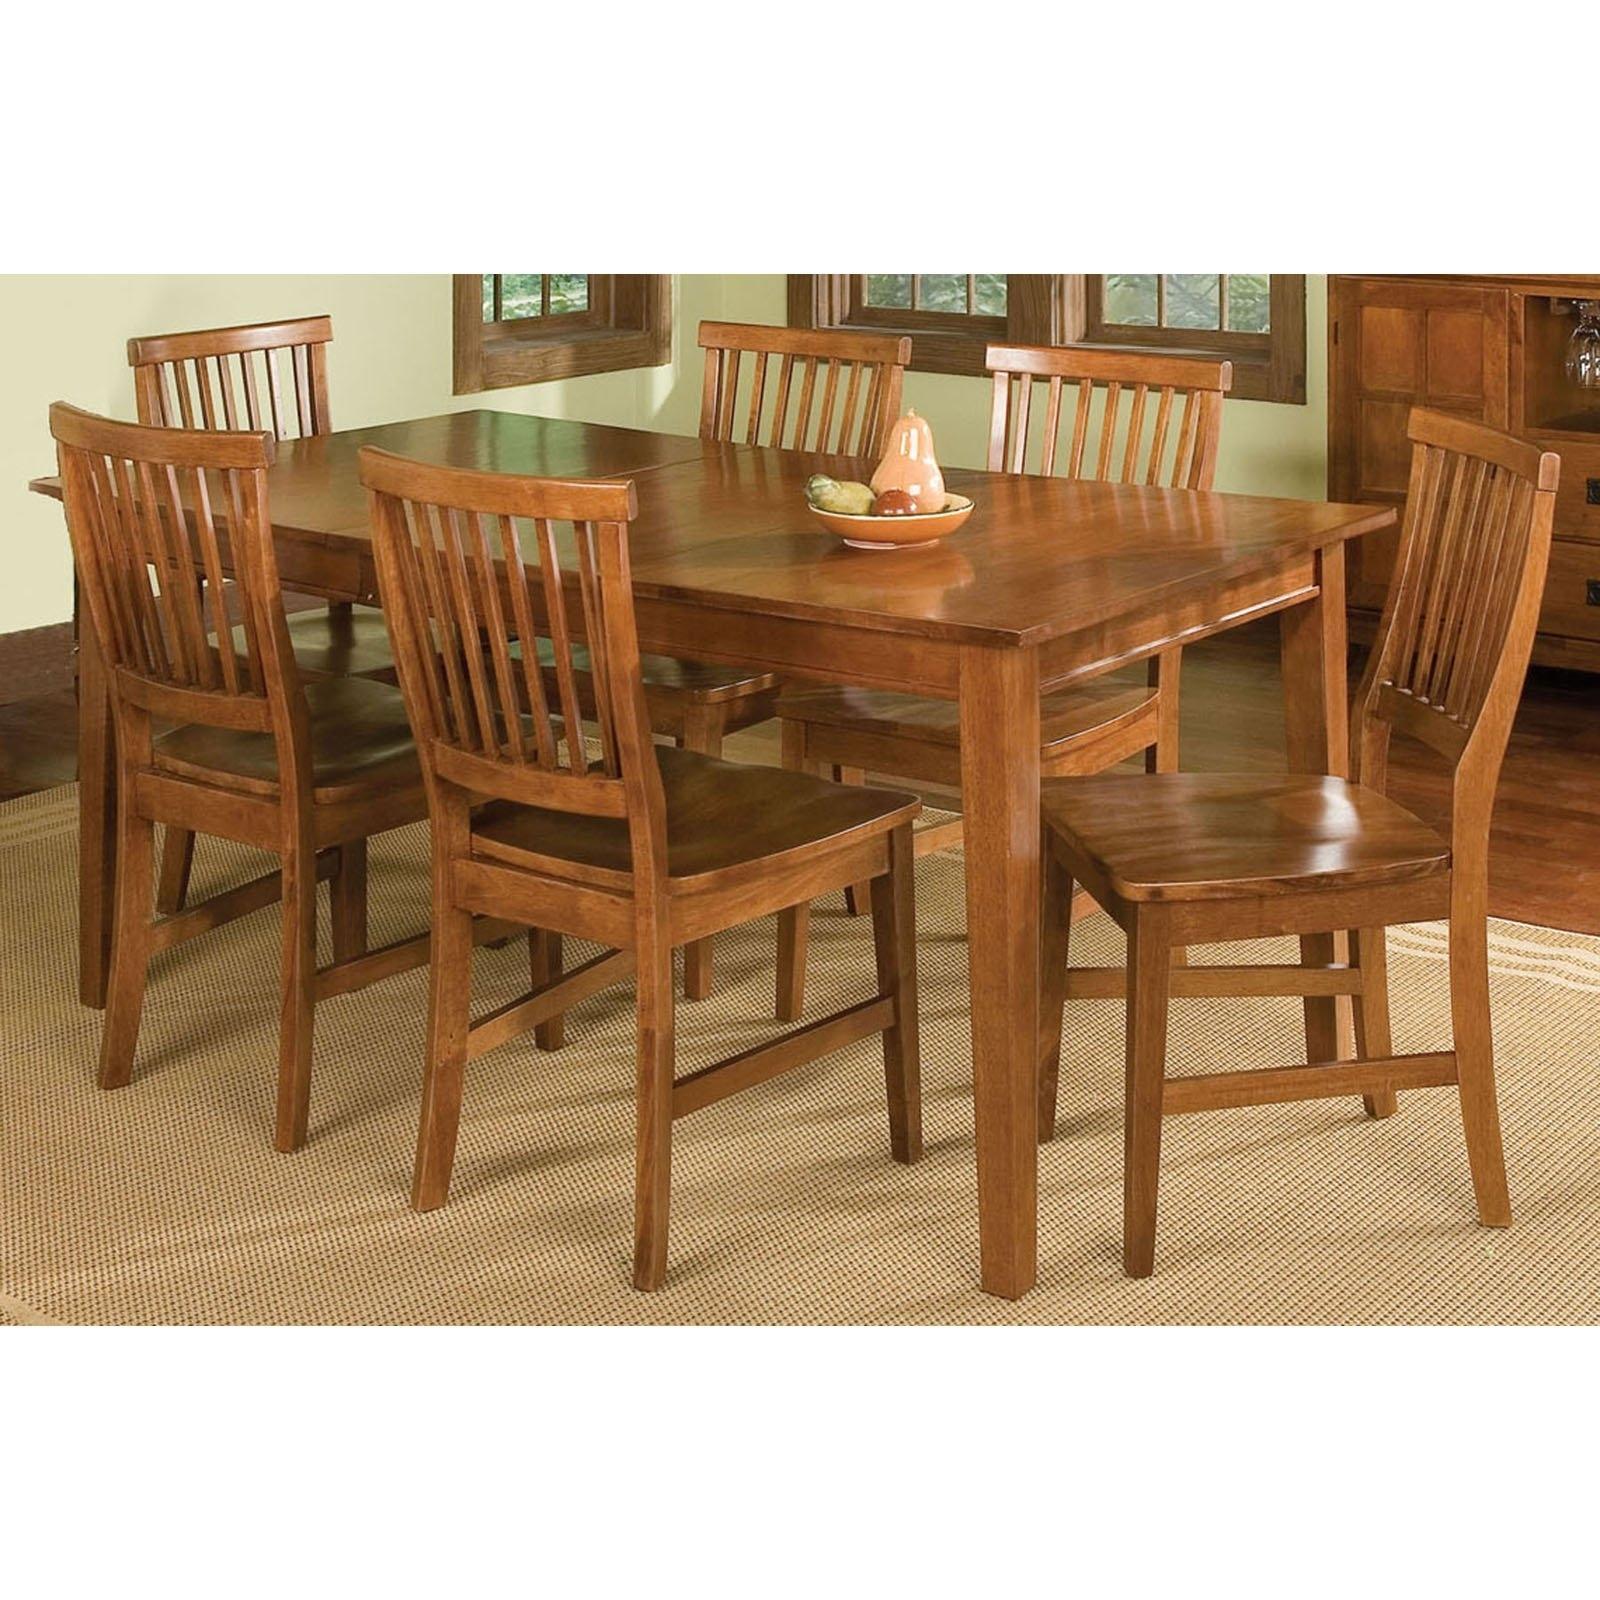 Most Popular Home Styles Arts & Crafts 7 Piece Dining Set, Cottage Oak – Walmart Regarding Oak Dining Tables Sets (View 10 of 25)